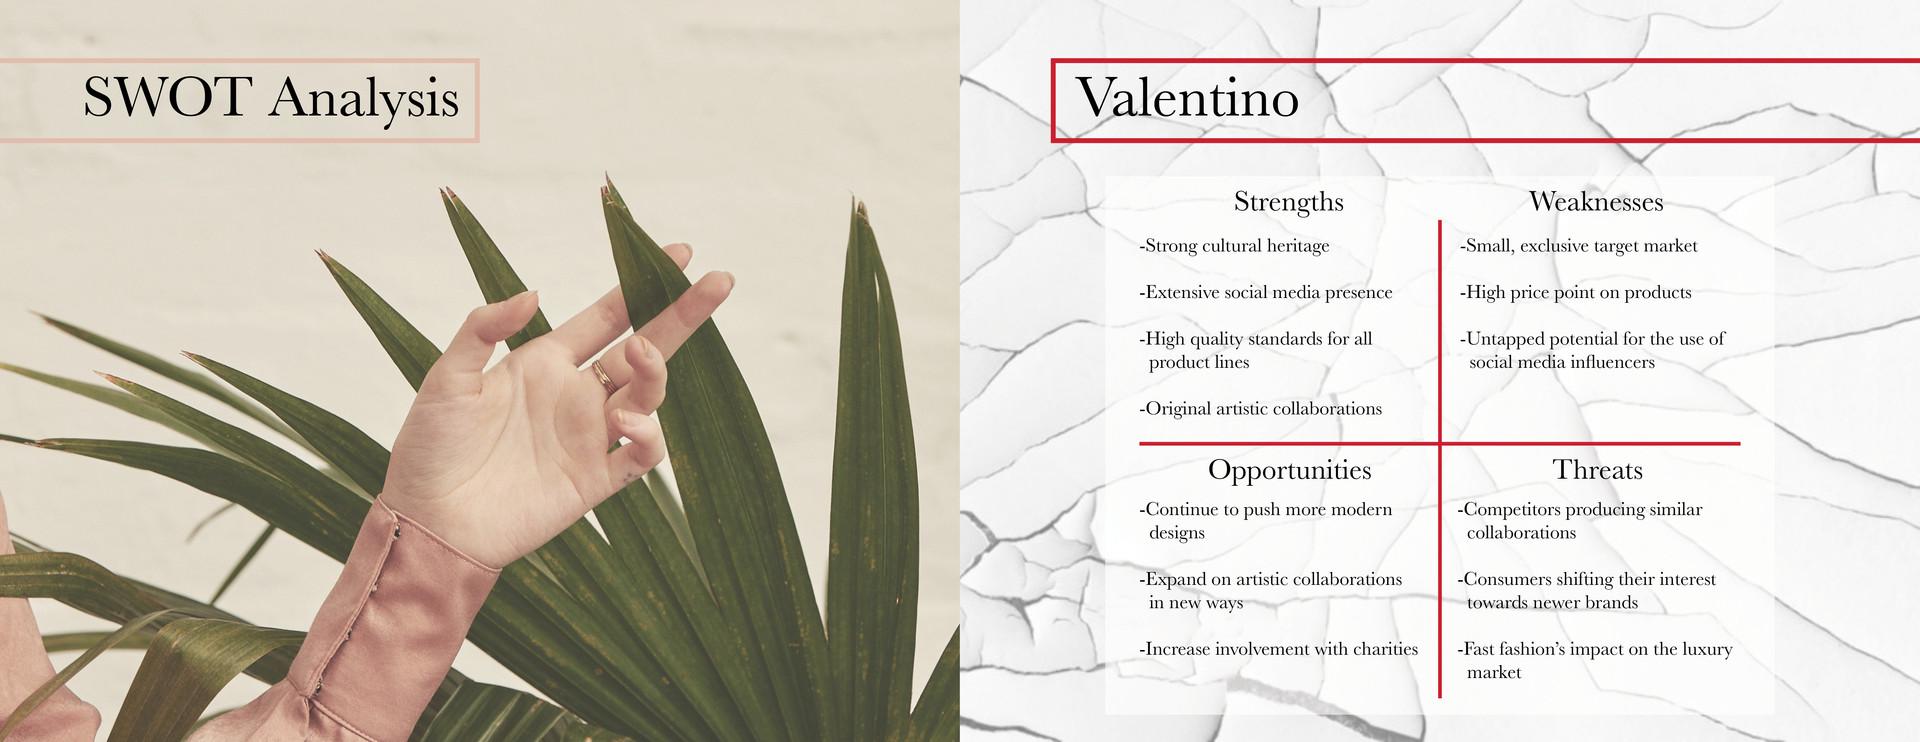 Love, Valentino